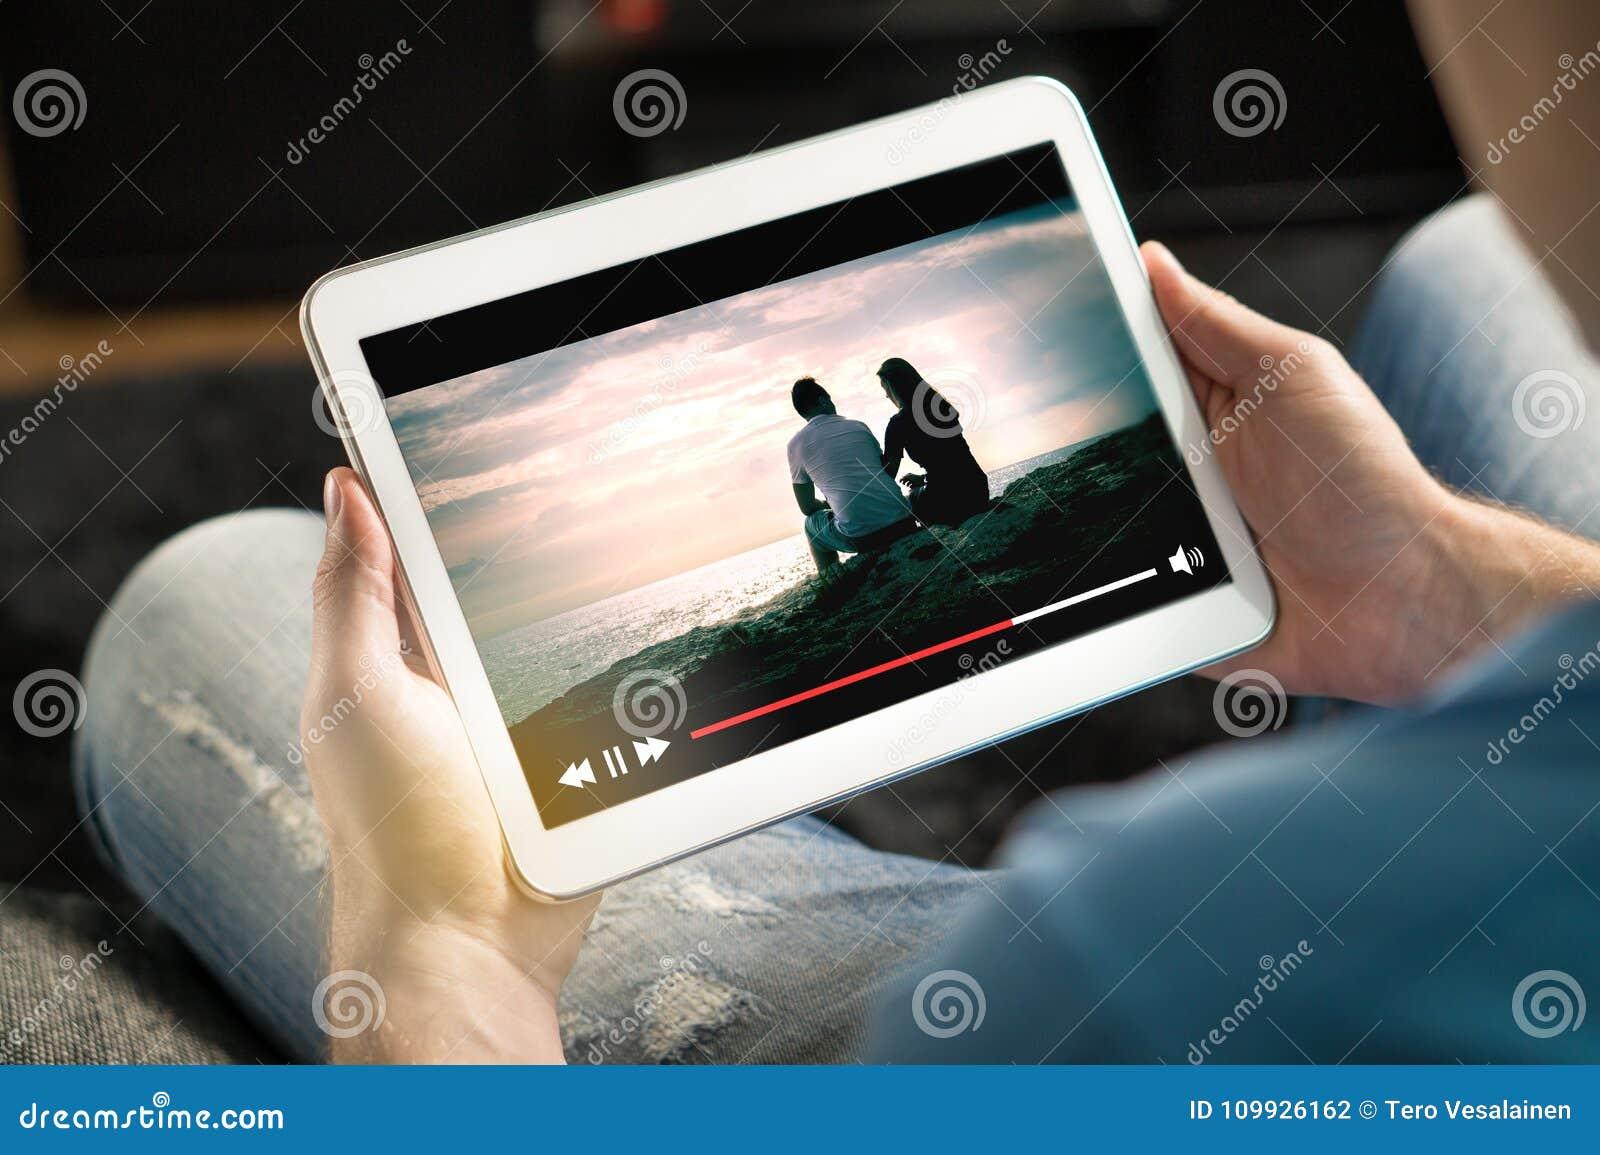 Online filmstroom met mobiel apparaat